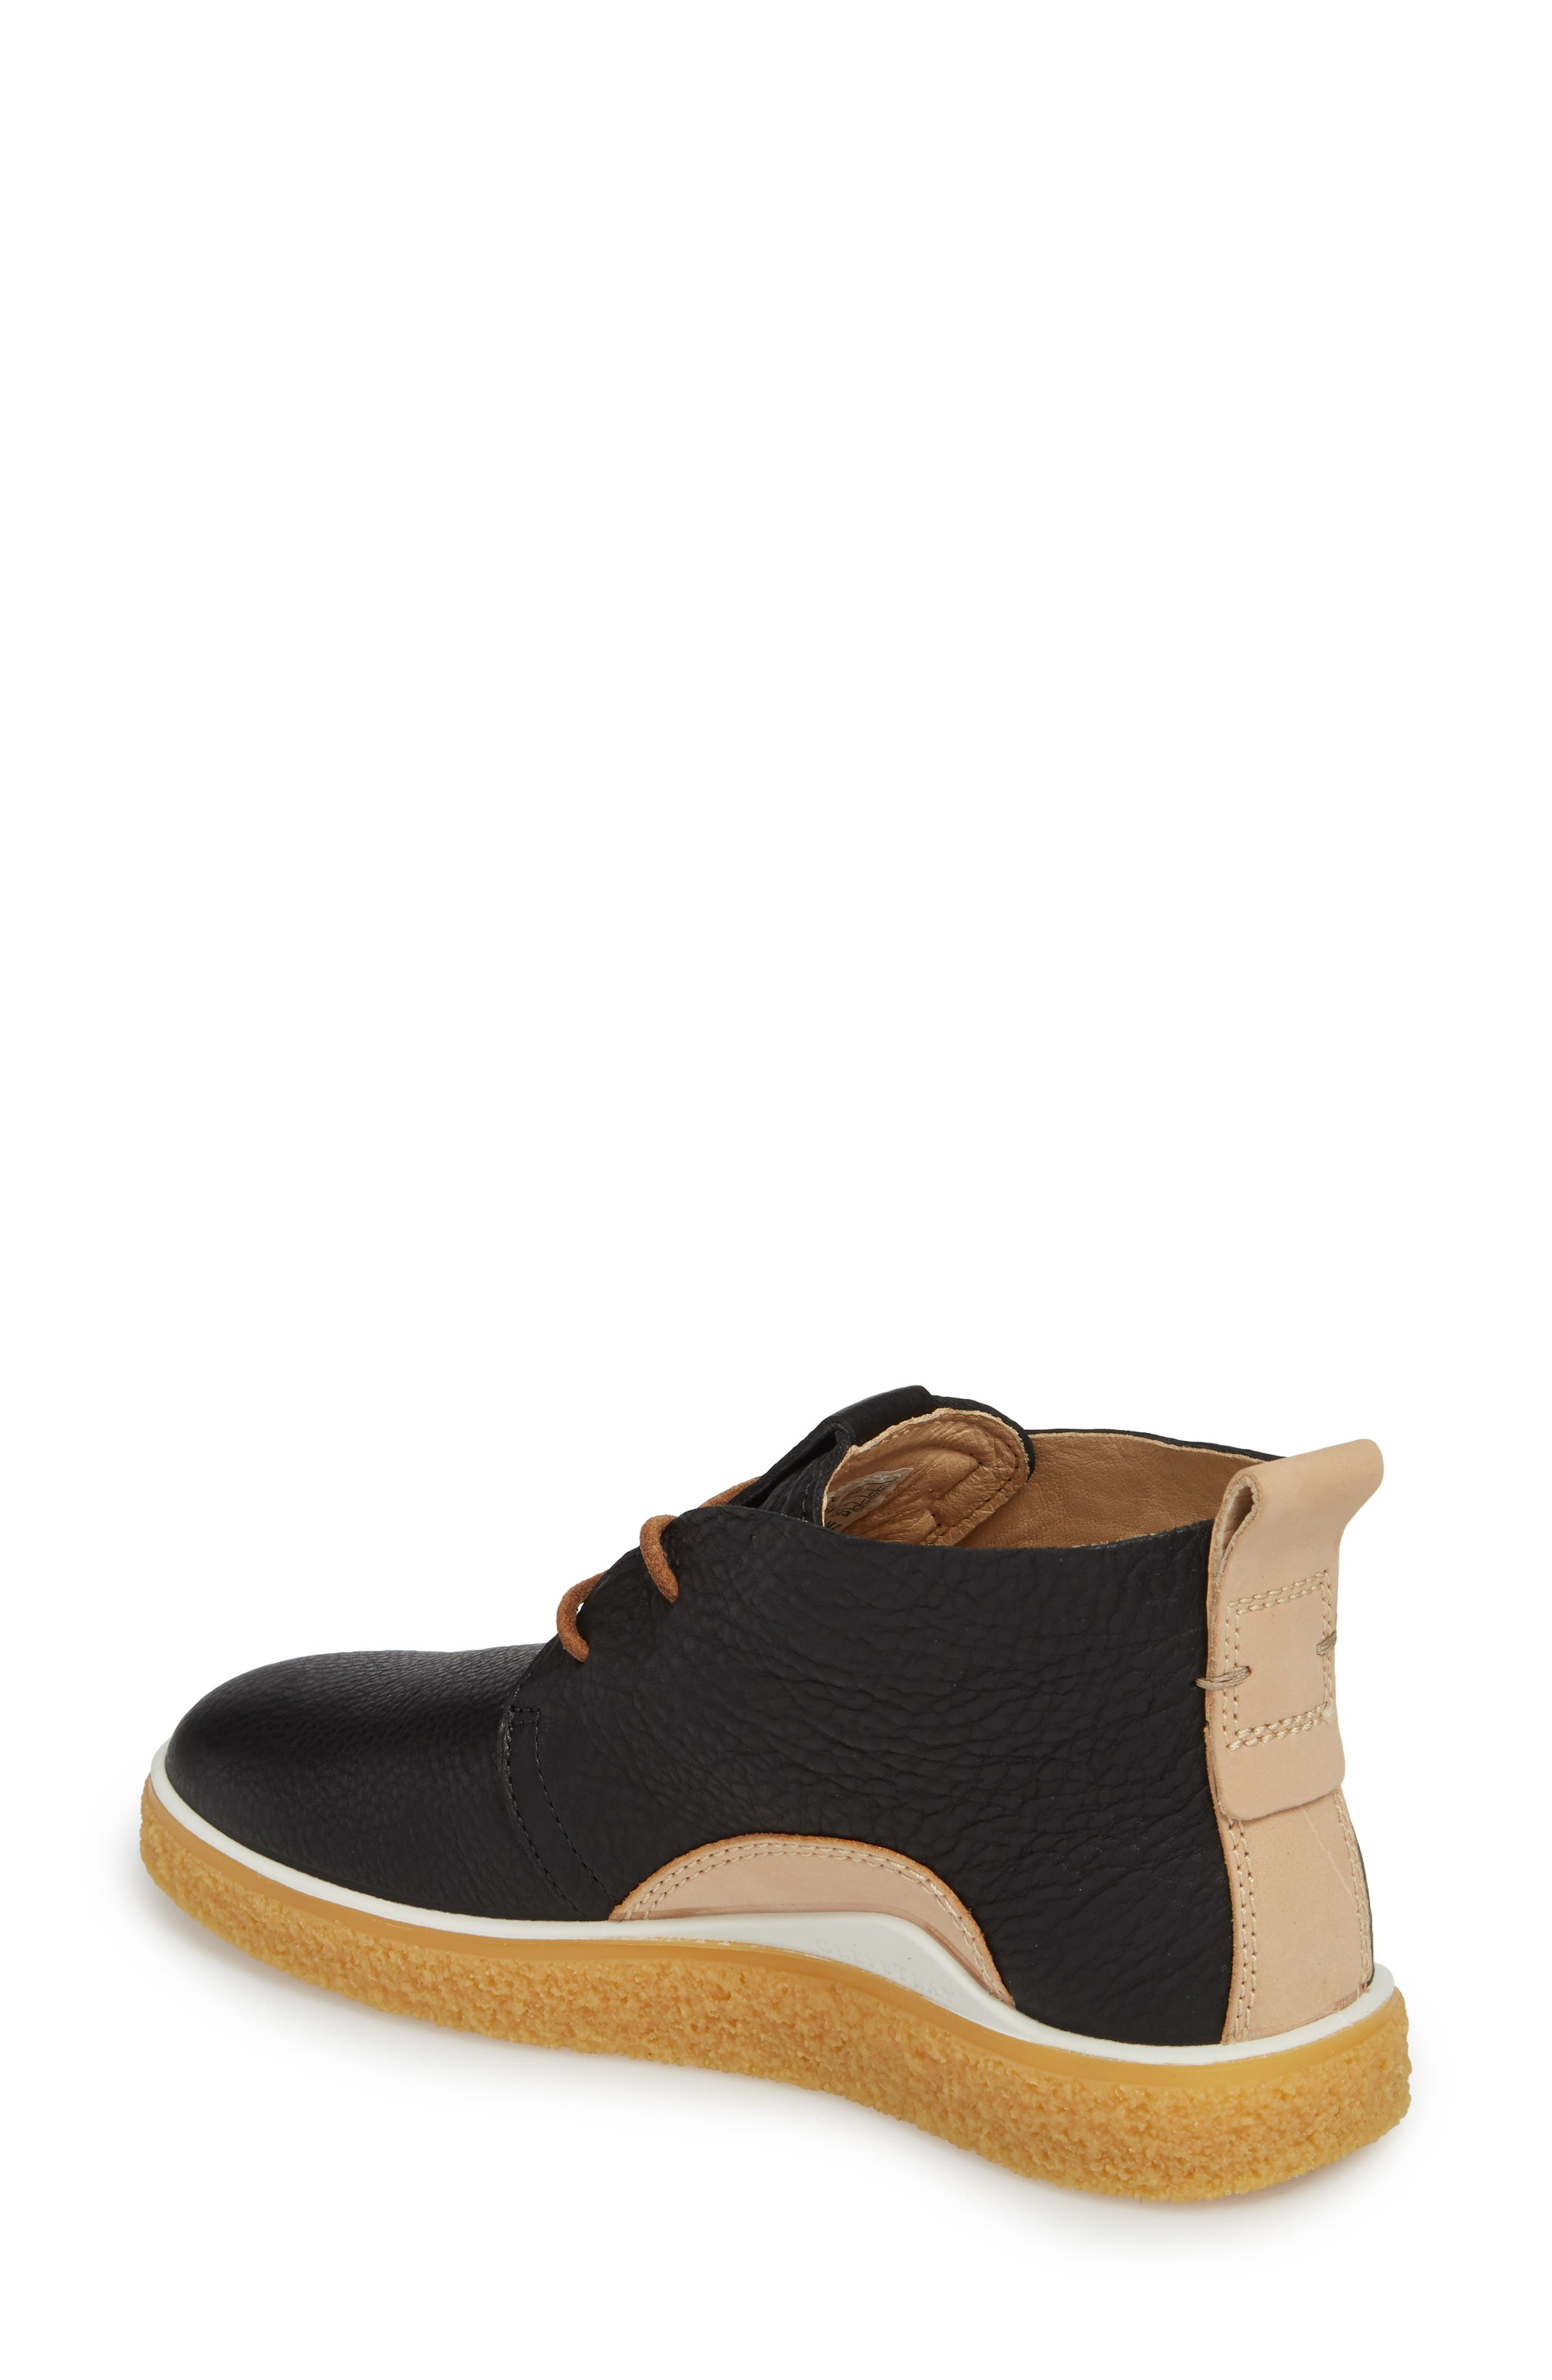 Crepetray Chukka Boot,                             Alternate thumbnail 2, color,                             Black Powder Leather